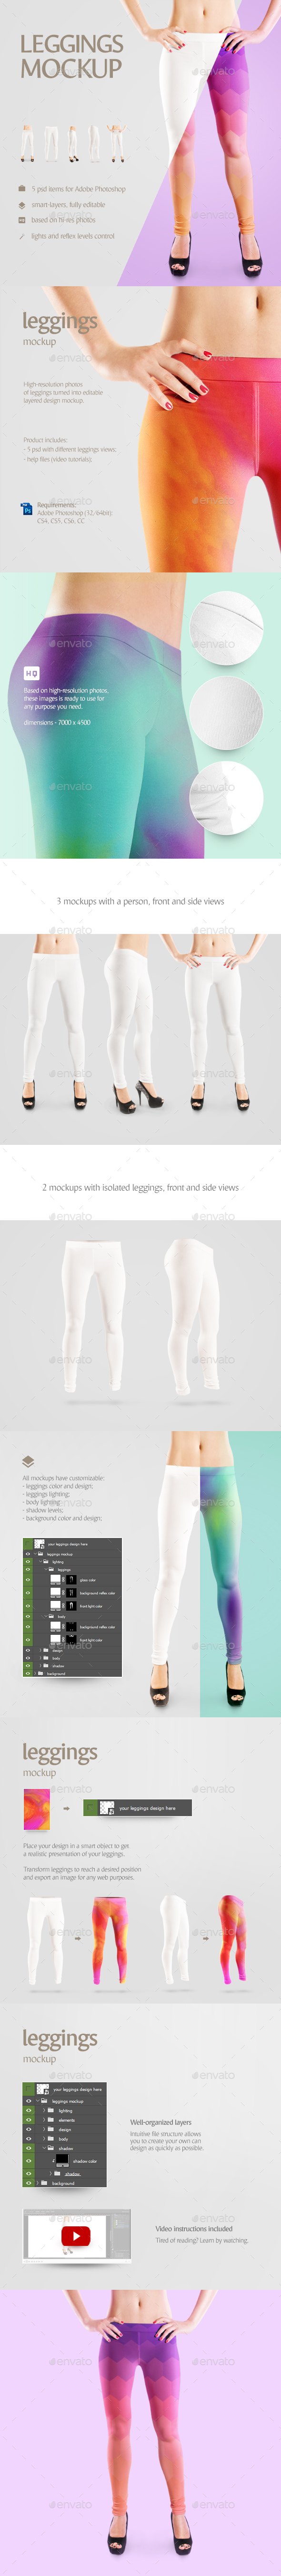 Leggings Mockup - Miscellaneous Apparel